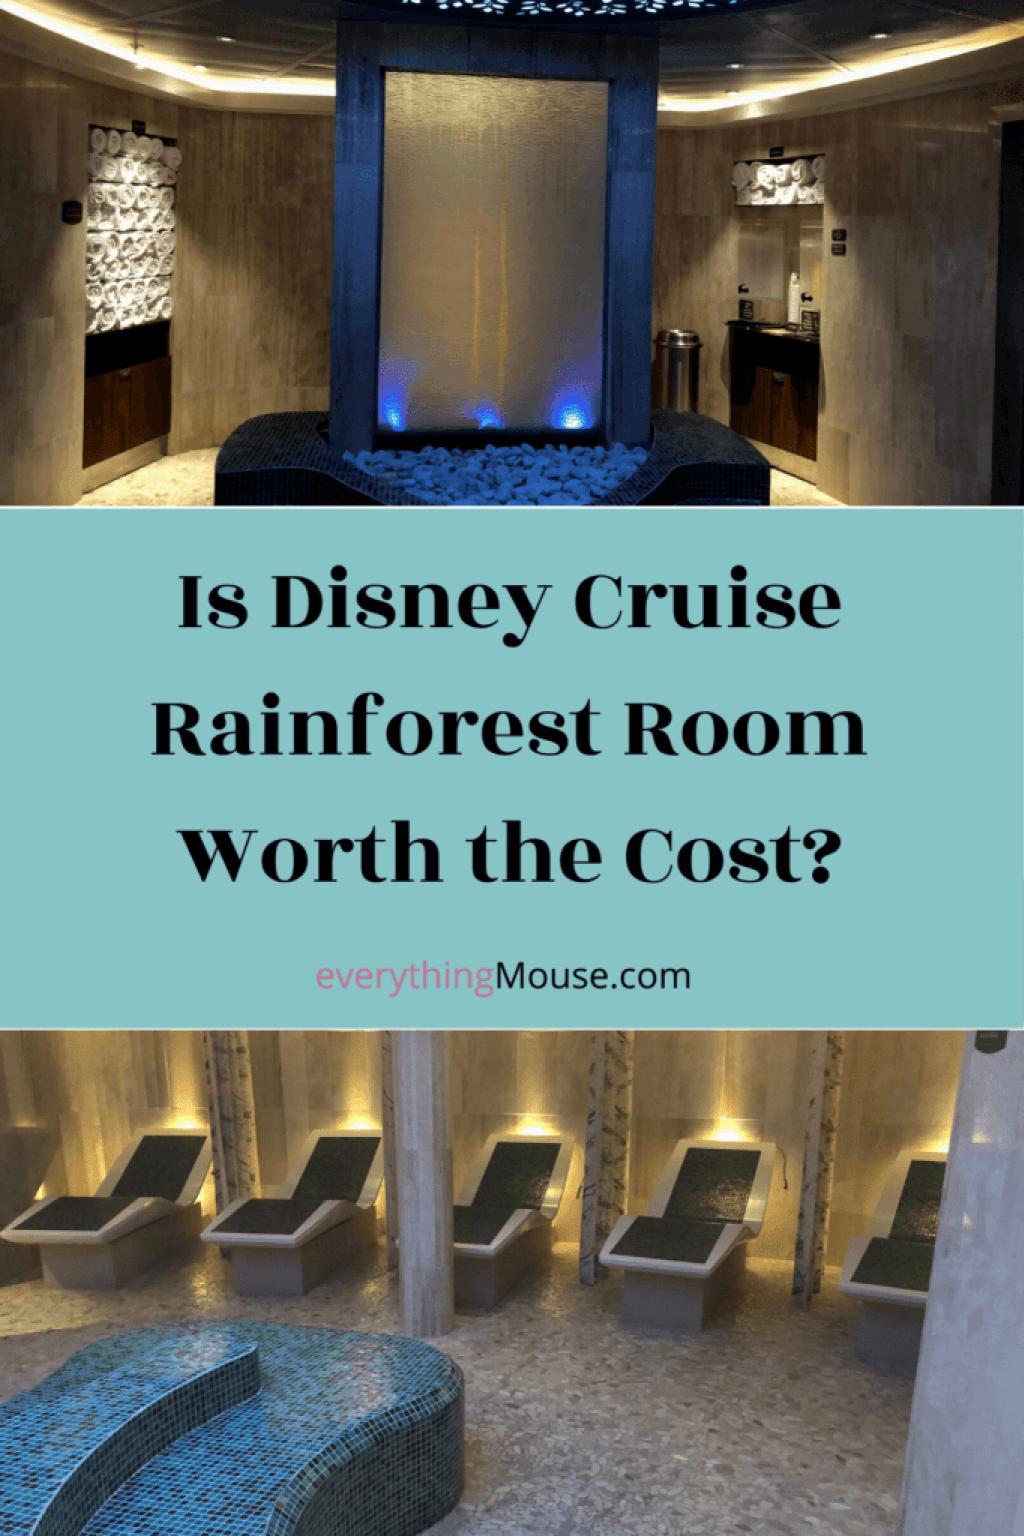 Disney Cruise Rainforest Room Everythingmouse Guide To Disney In 2020 Disney Cruise Disney Cruise Tips Disney Cruise Alaska [ png ]